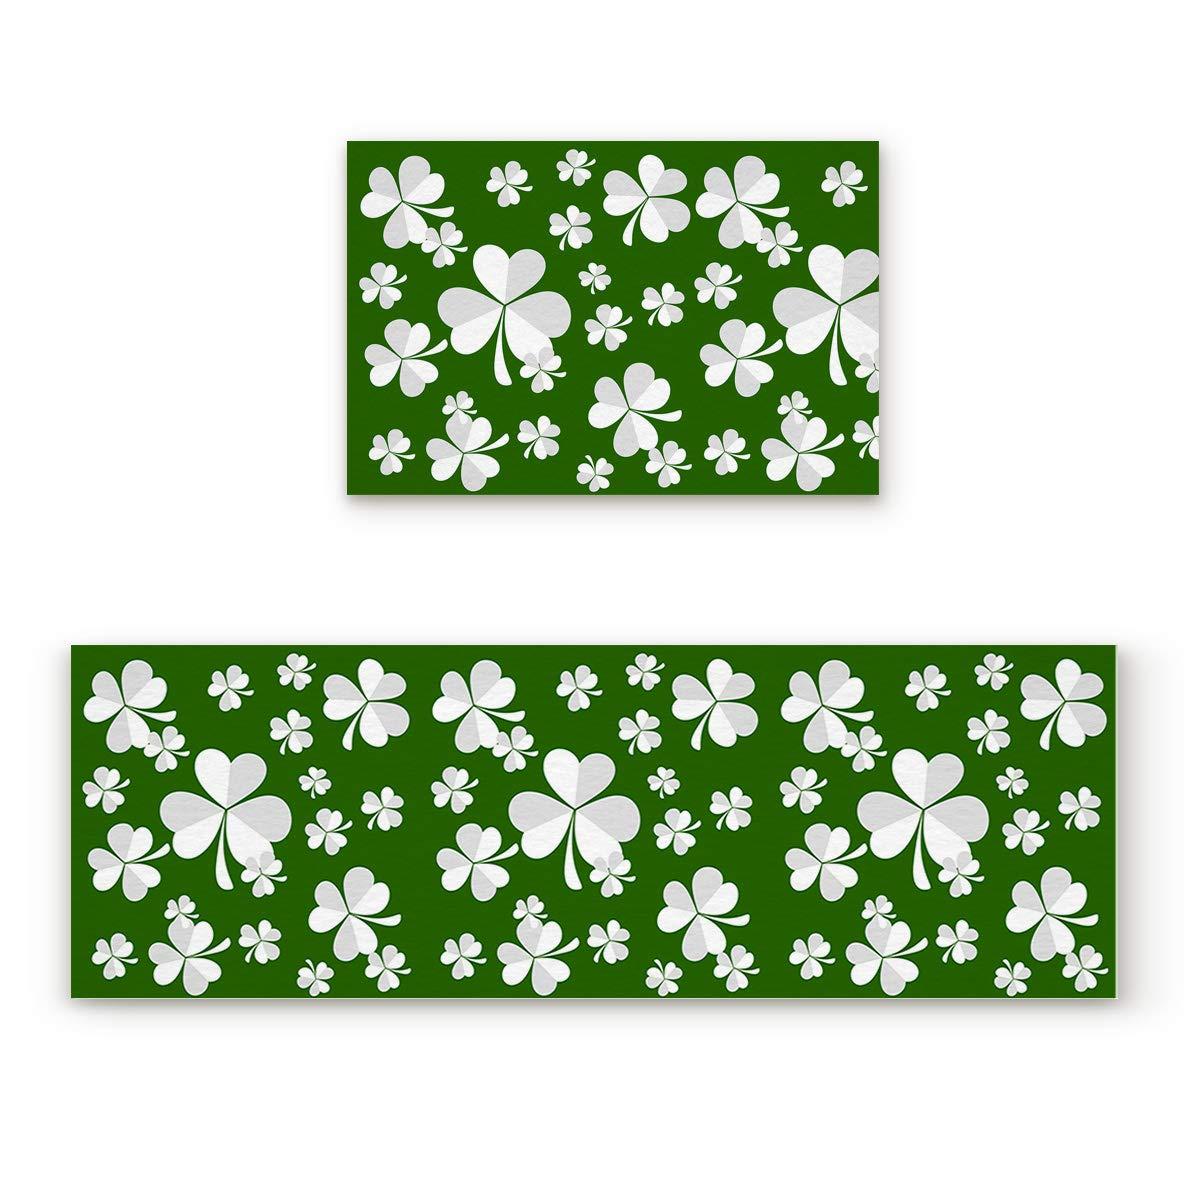 "Aomike 2 Piece Non-Slip Kitchen Mat Rubber Backing Doormat Green and White Shamrocks Runner Rug Set, Hallway Living Room Balcony Bathroom Carpet Sets (15.7"" x 23.6""+15.7"" x 47.2"")"